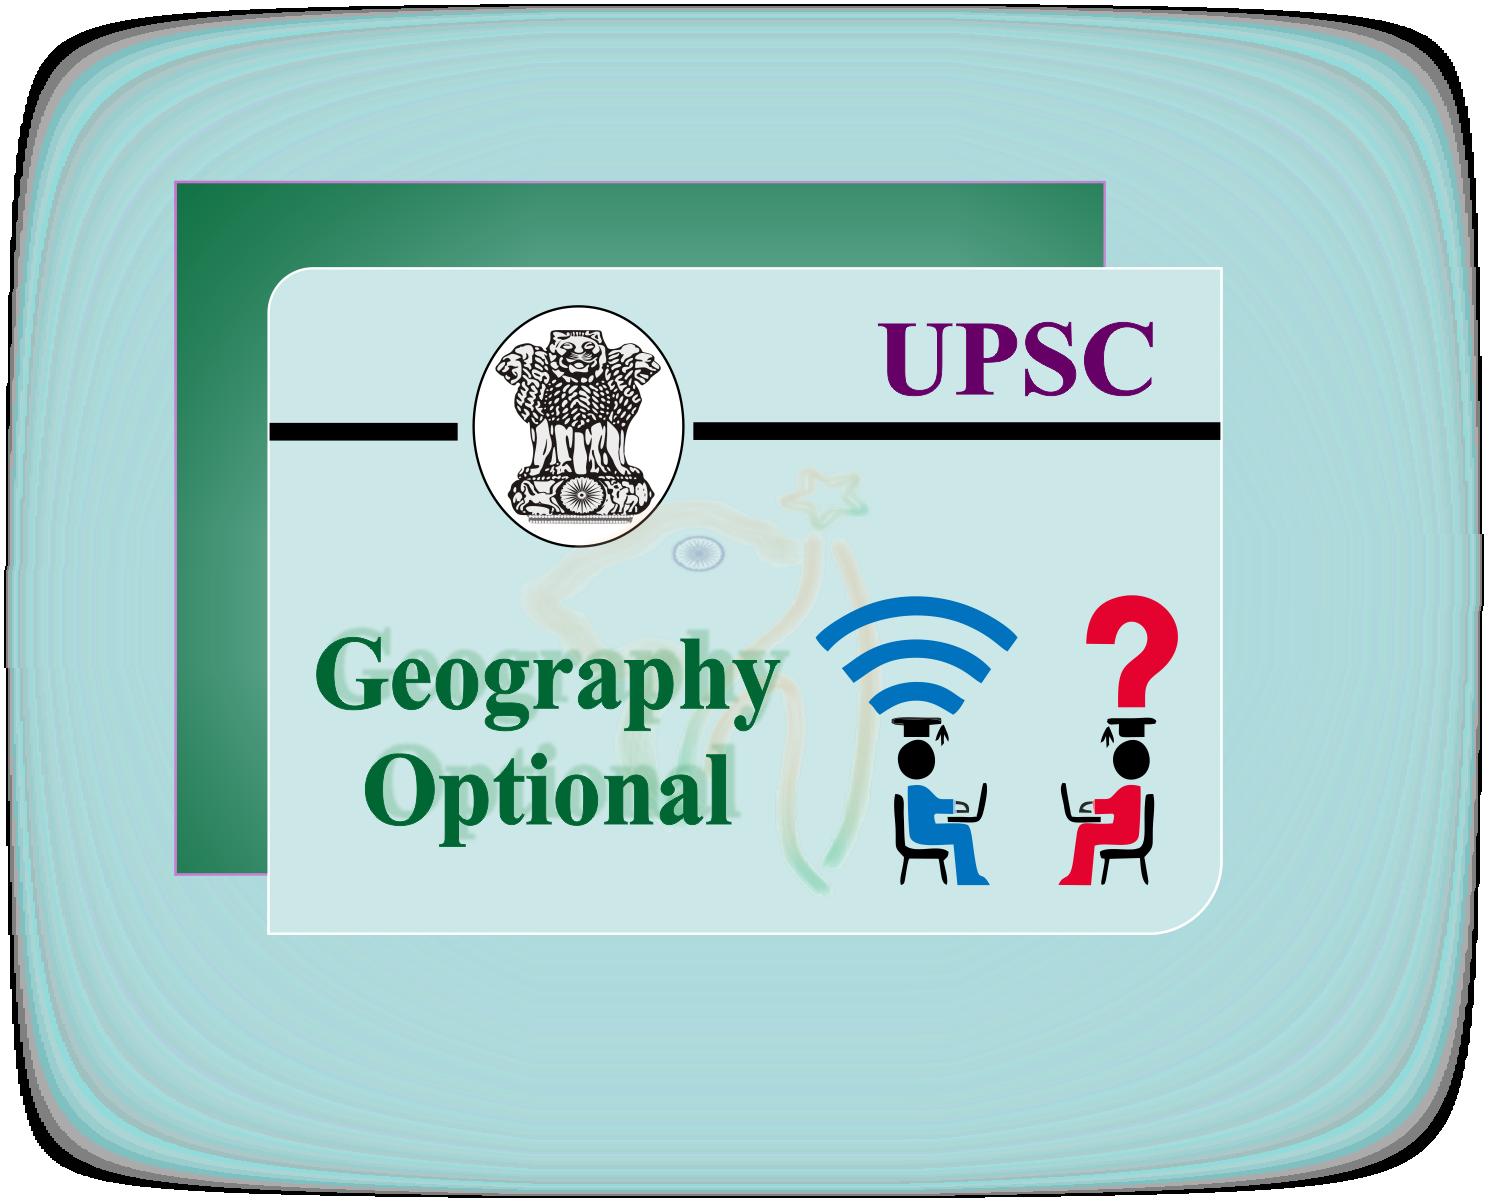 UPSC Geography Optional